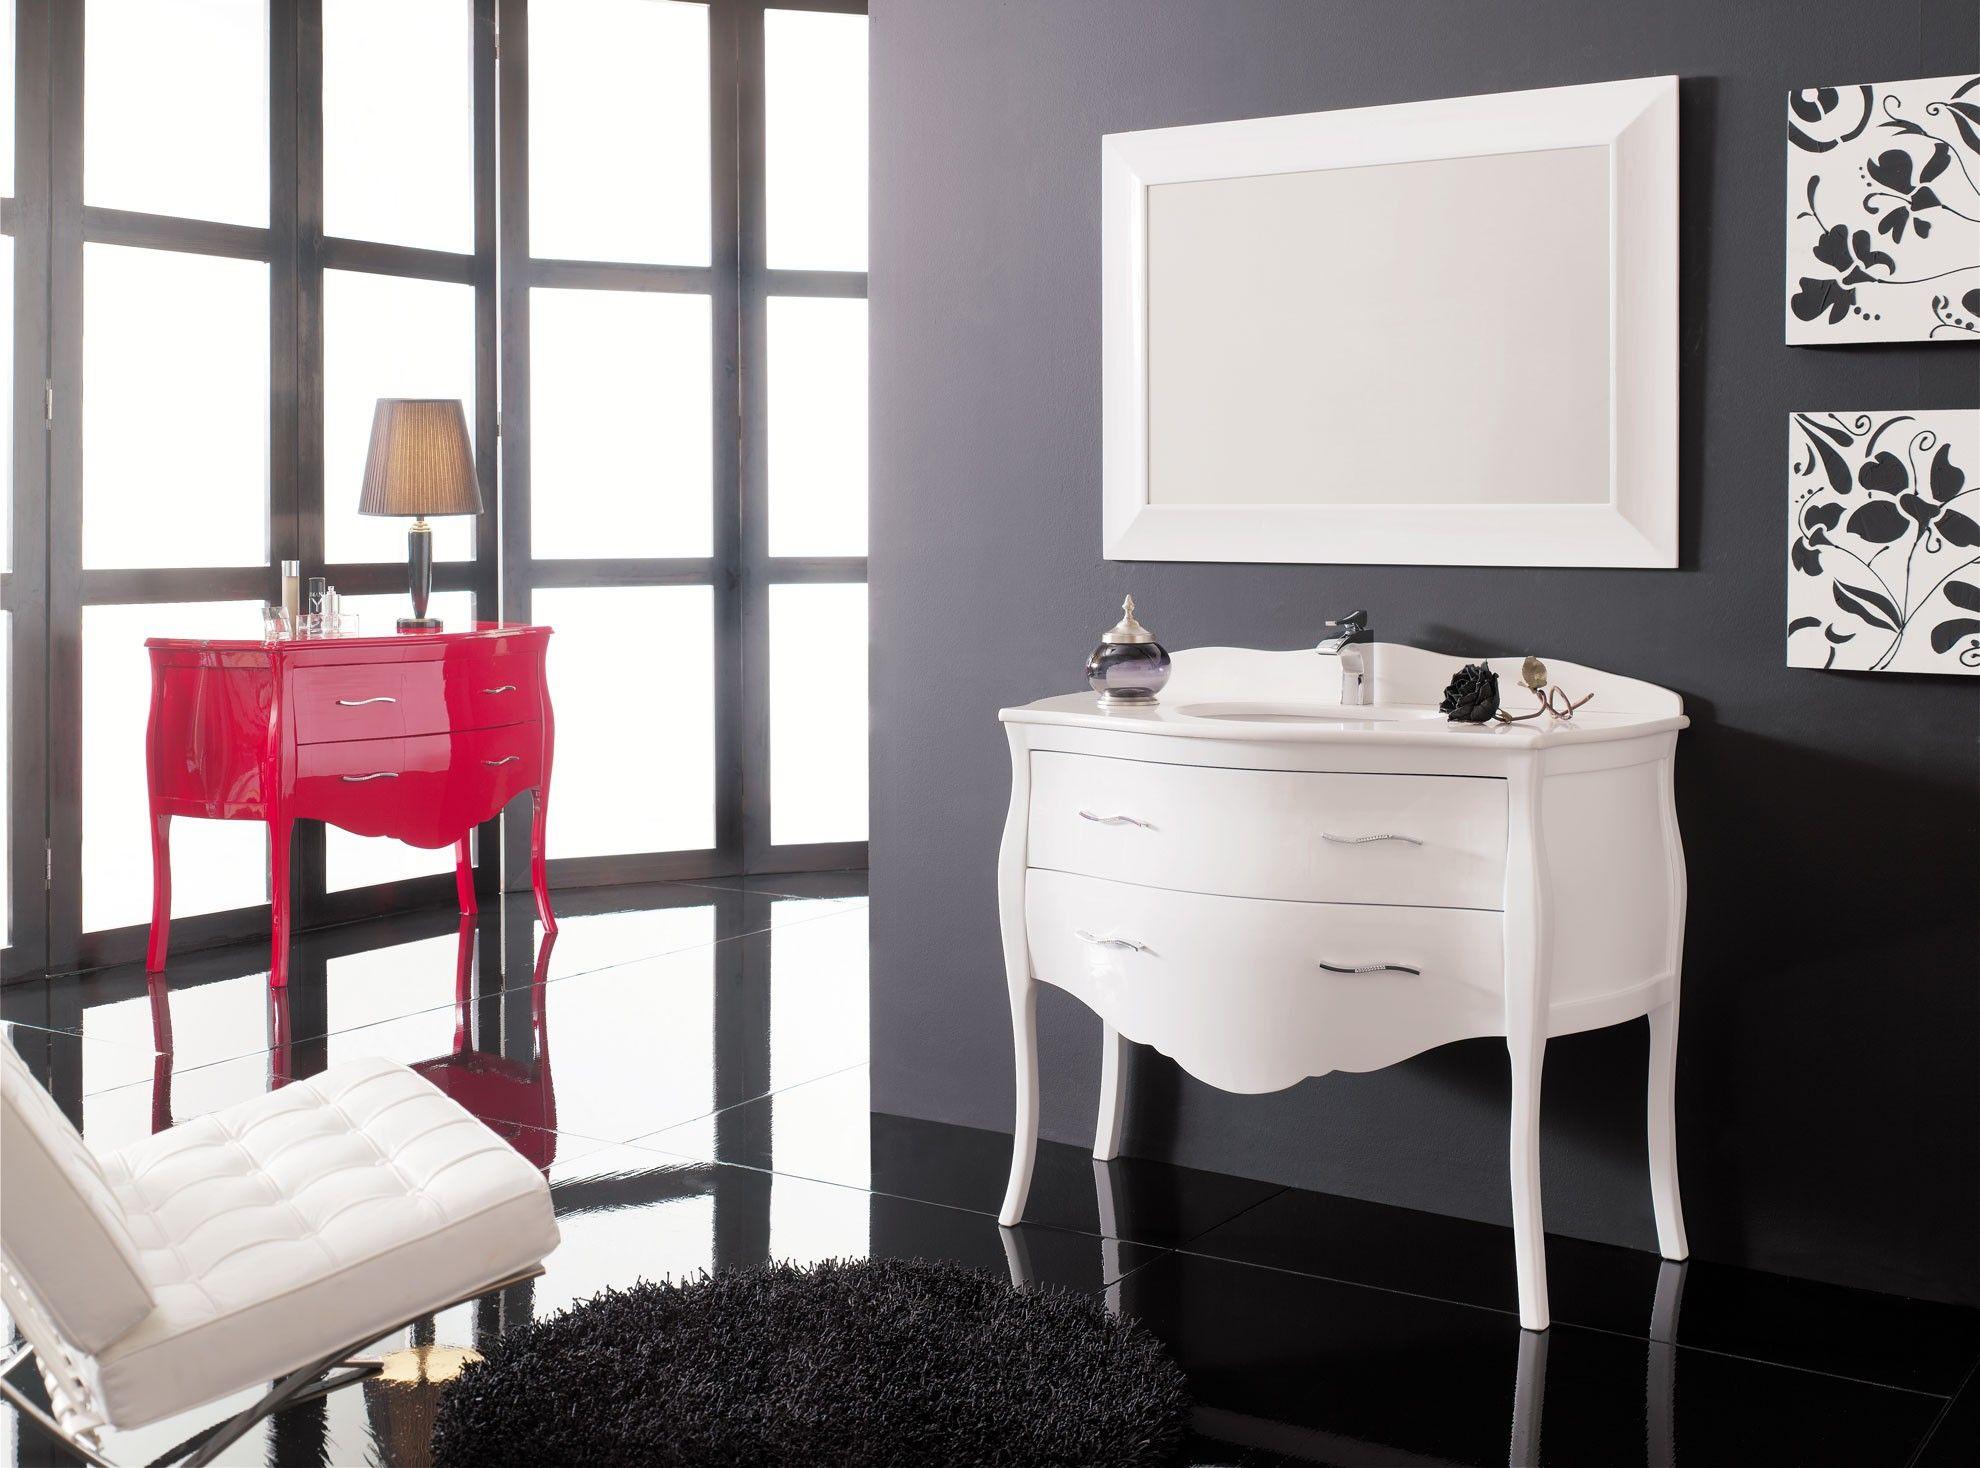 Mueble de baño Luis XV blanco brillo 90 cm. | Muebles | Pinterest